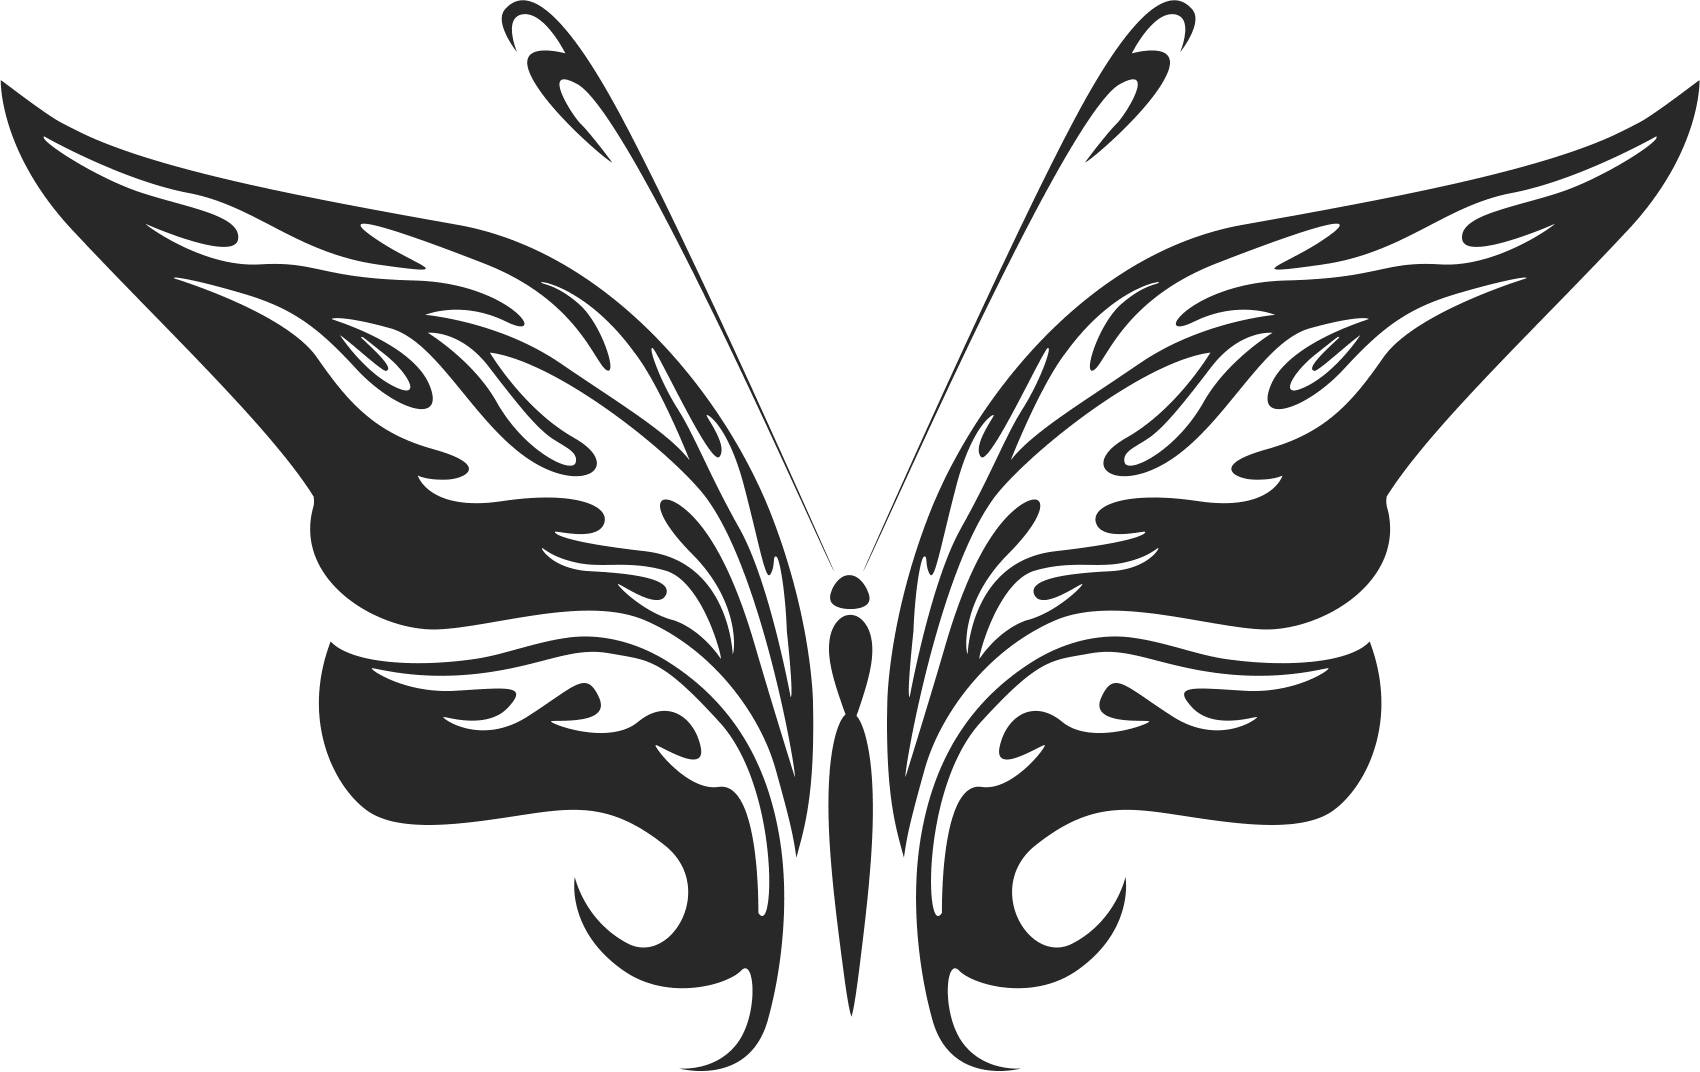 Butterfly Silhouette Sticker Free CDR Vectors Art